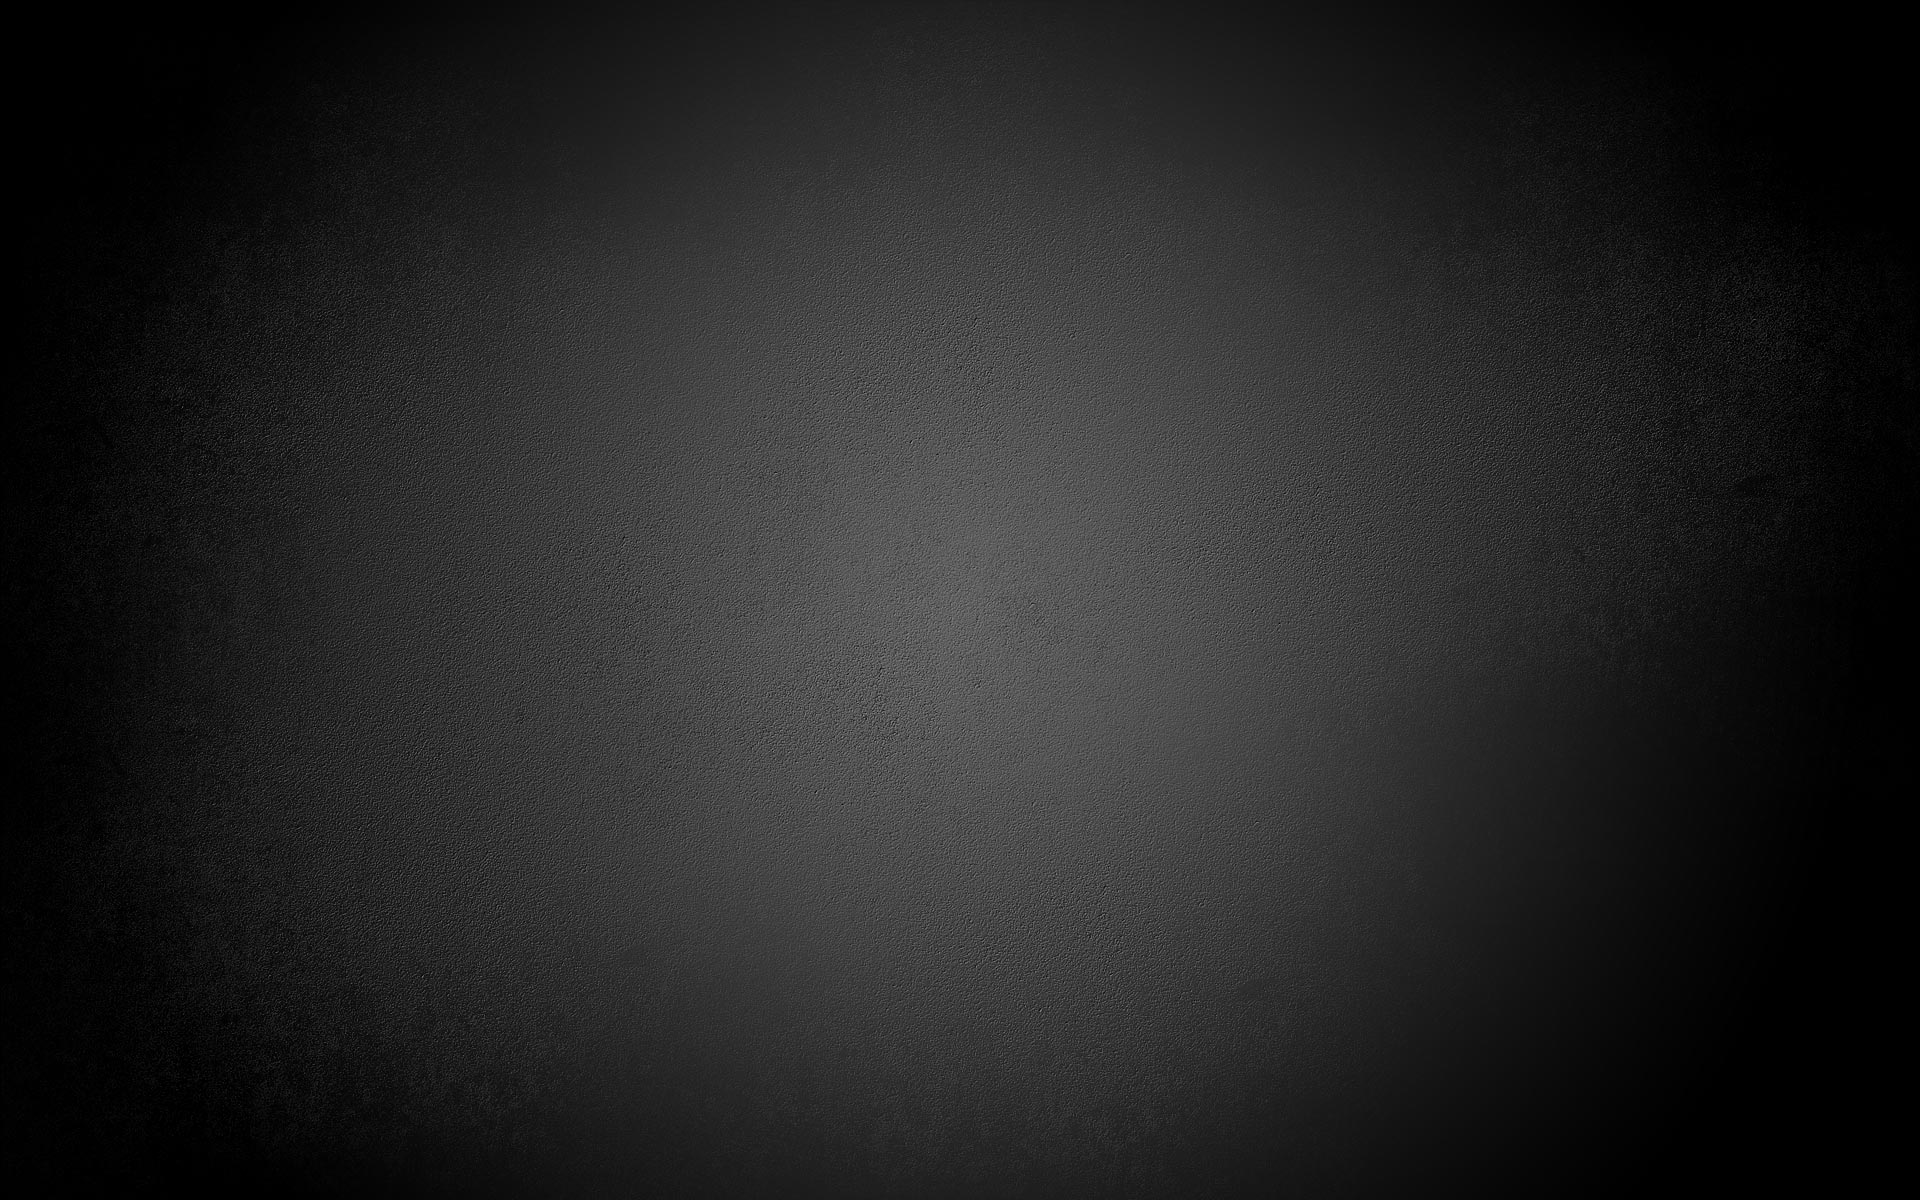 black abstract wallpaper images abstract wallpaper arunnath black